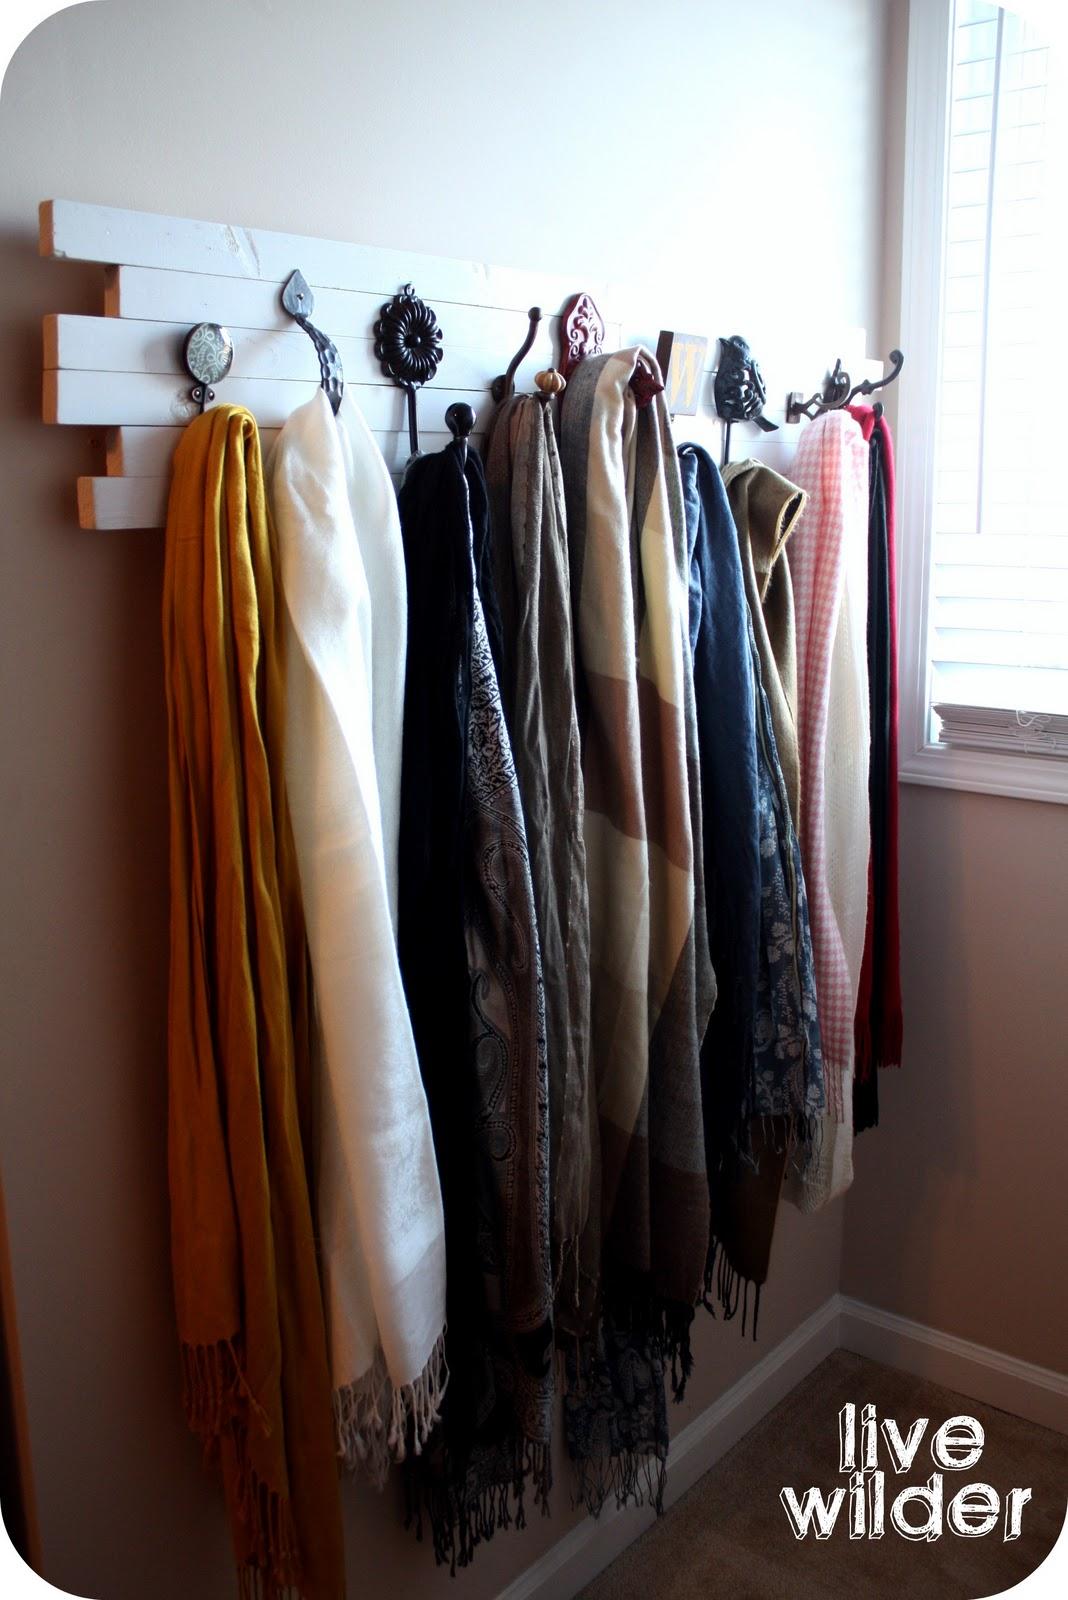 Scarf Hanger - Bing images